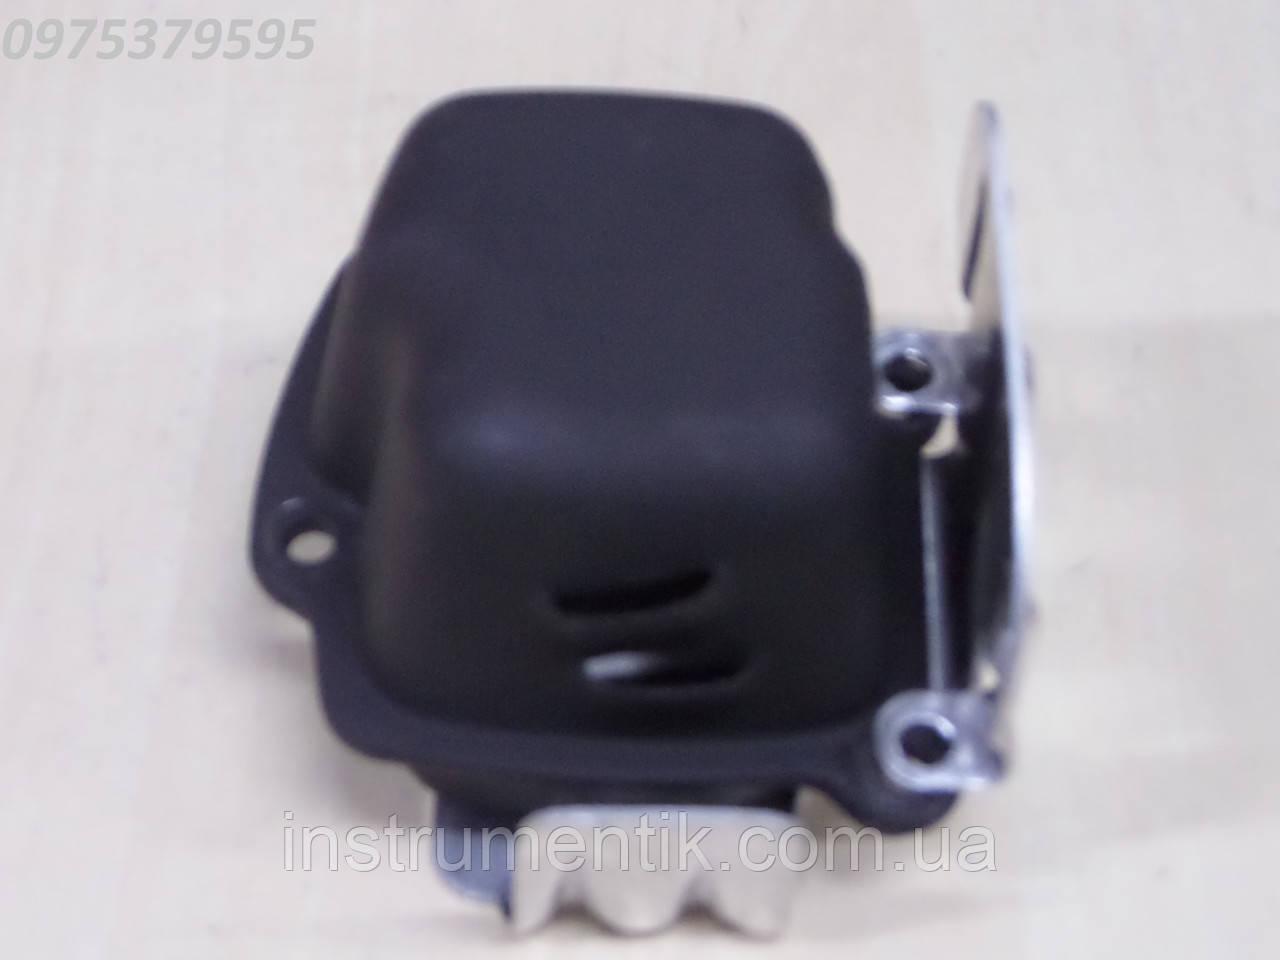 Глушник для Oleo-Mac GS 410 С, GS 370